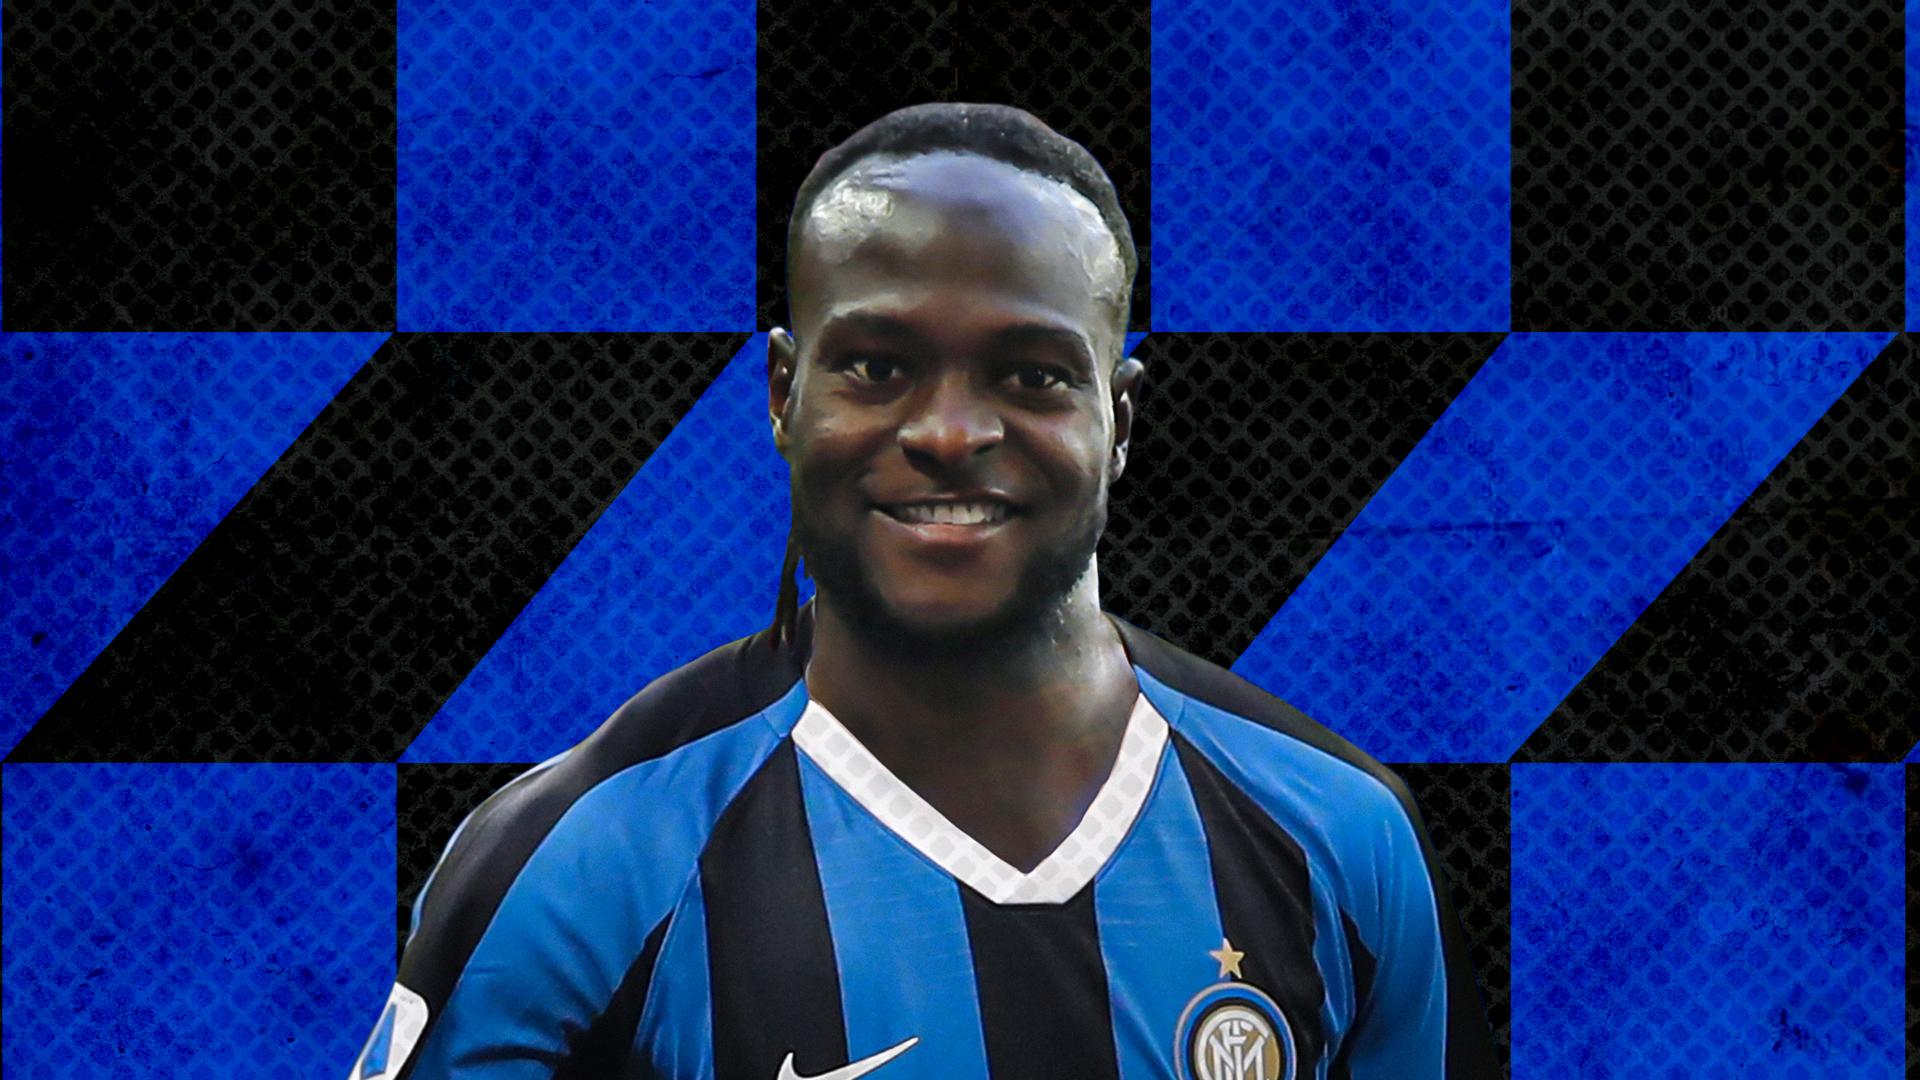 Lukaku's photo hints Moses will soon be an Inter Milan player